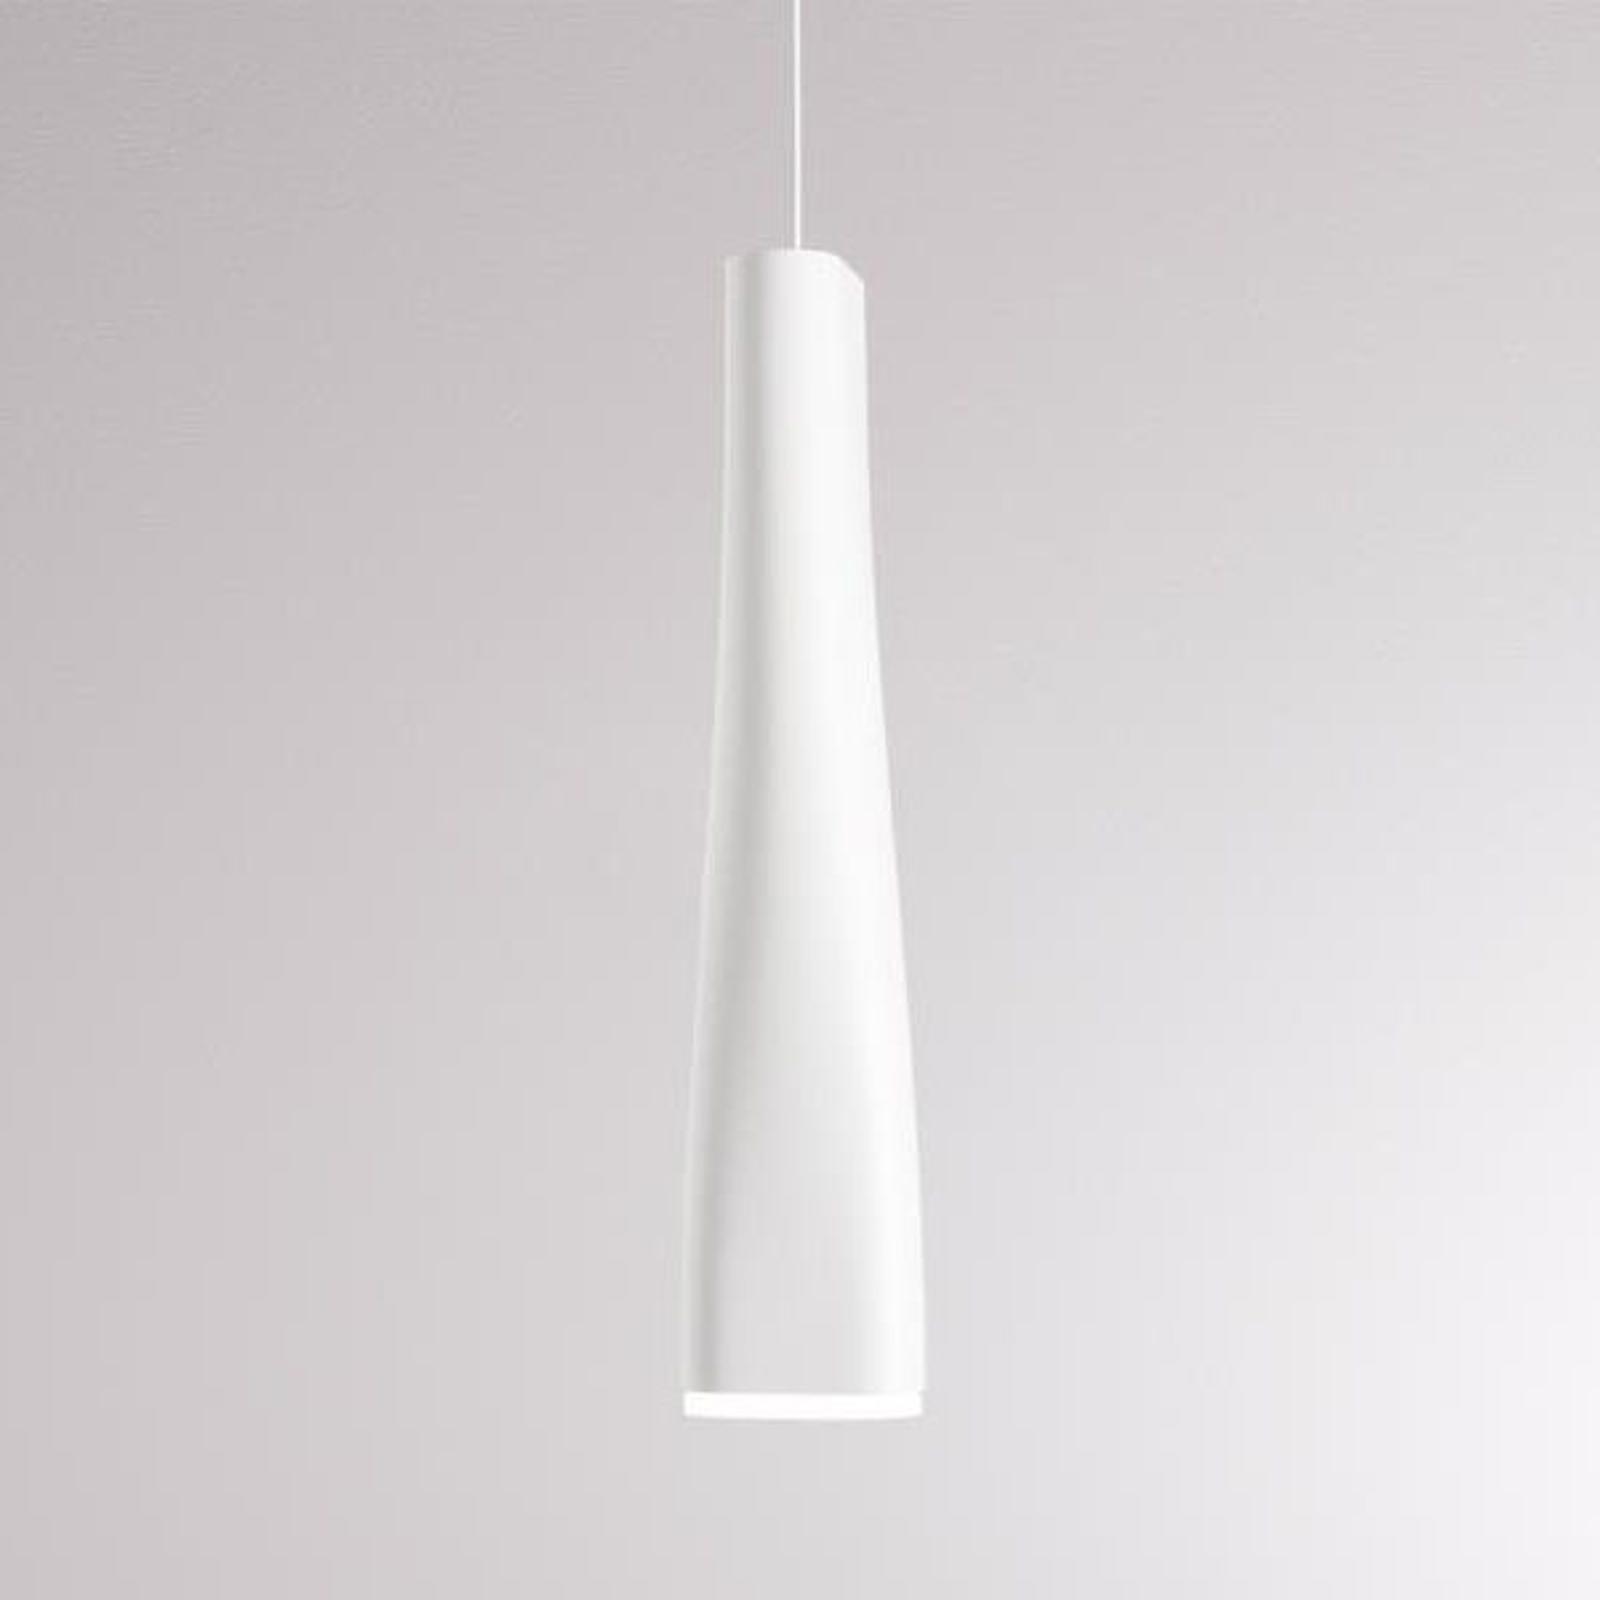 LOUM Fiume lampa wisząca LED biała